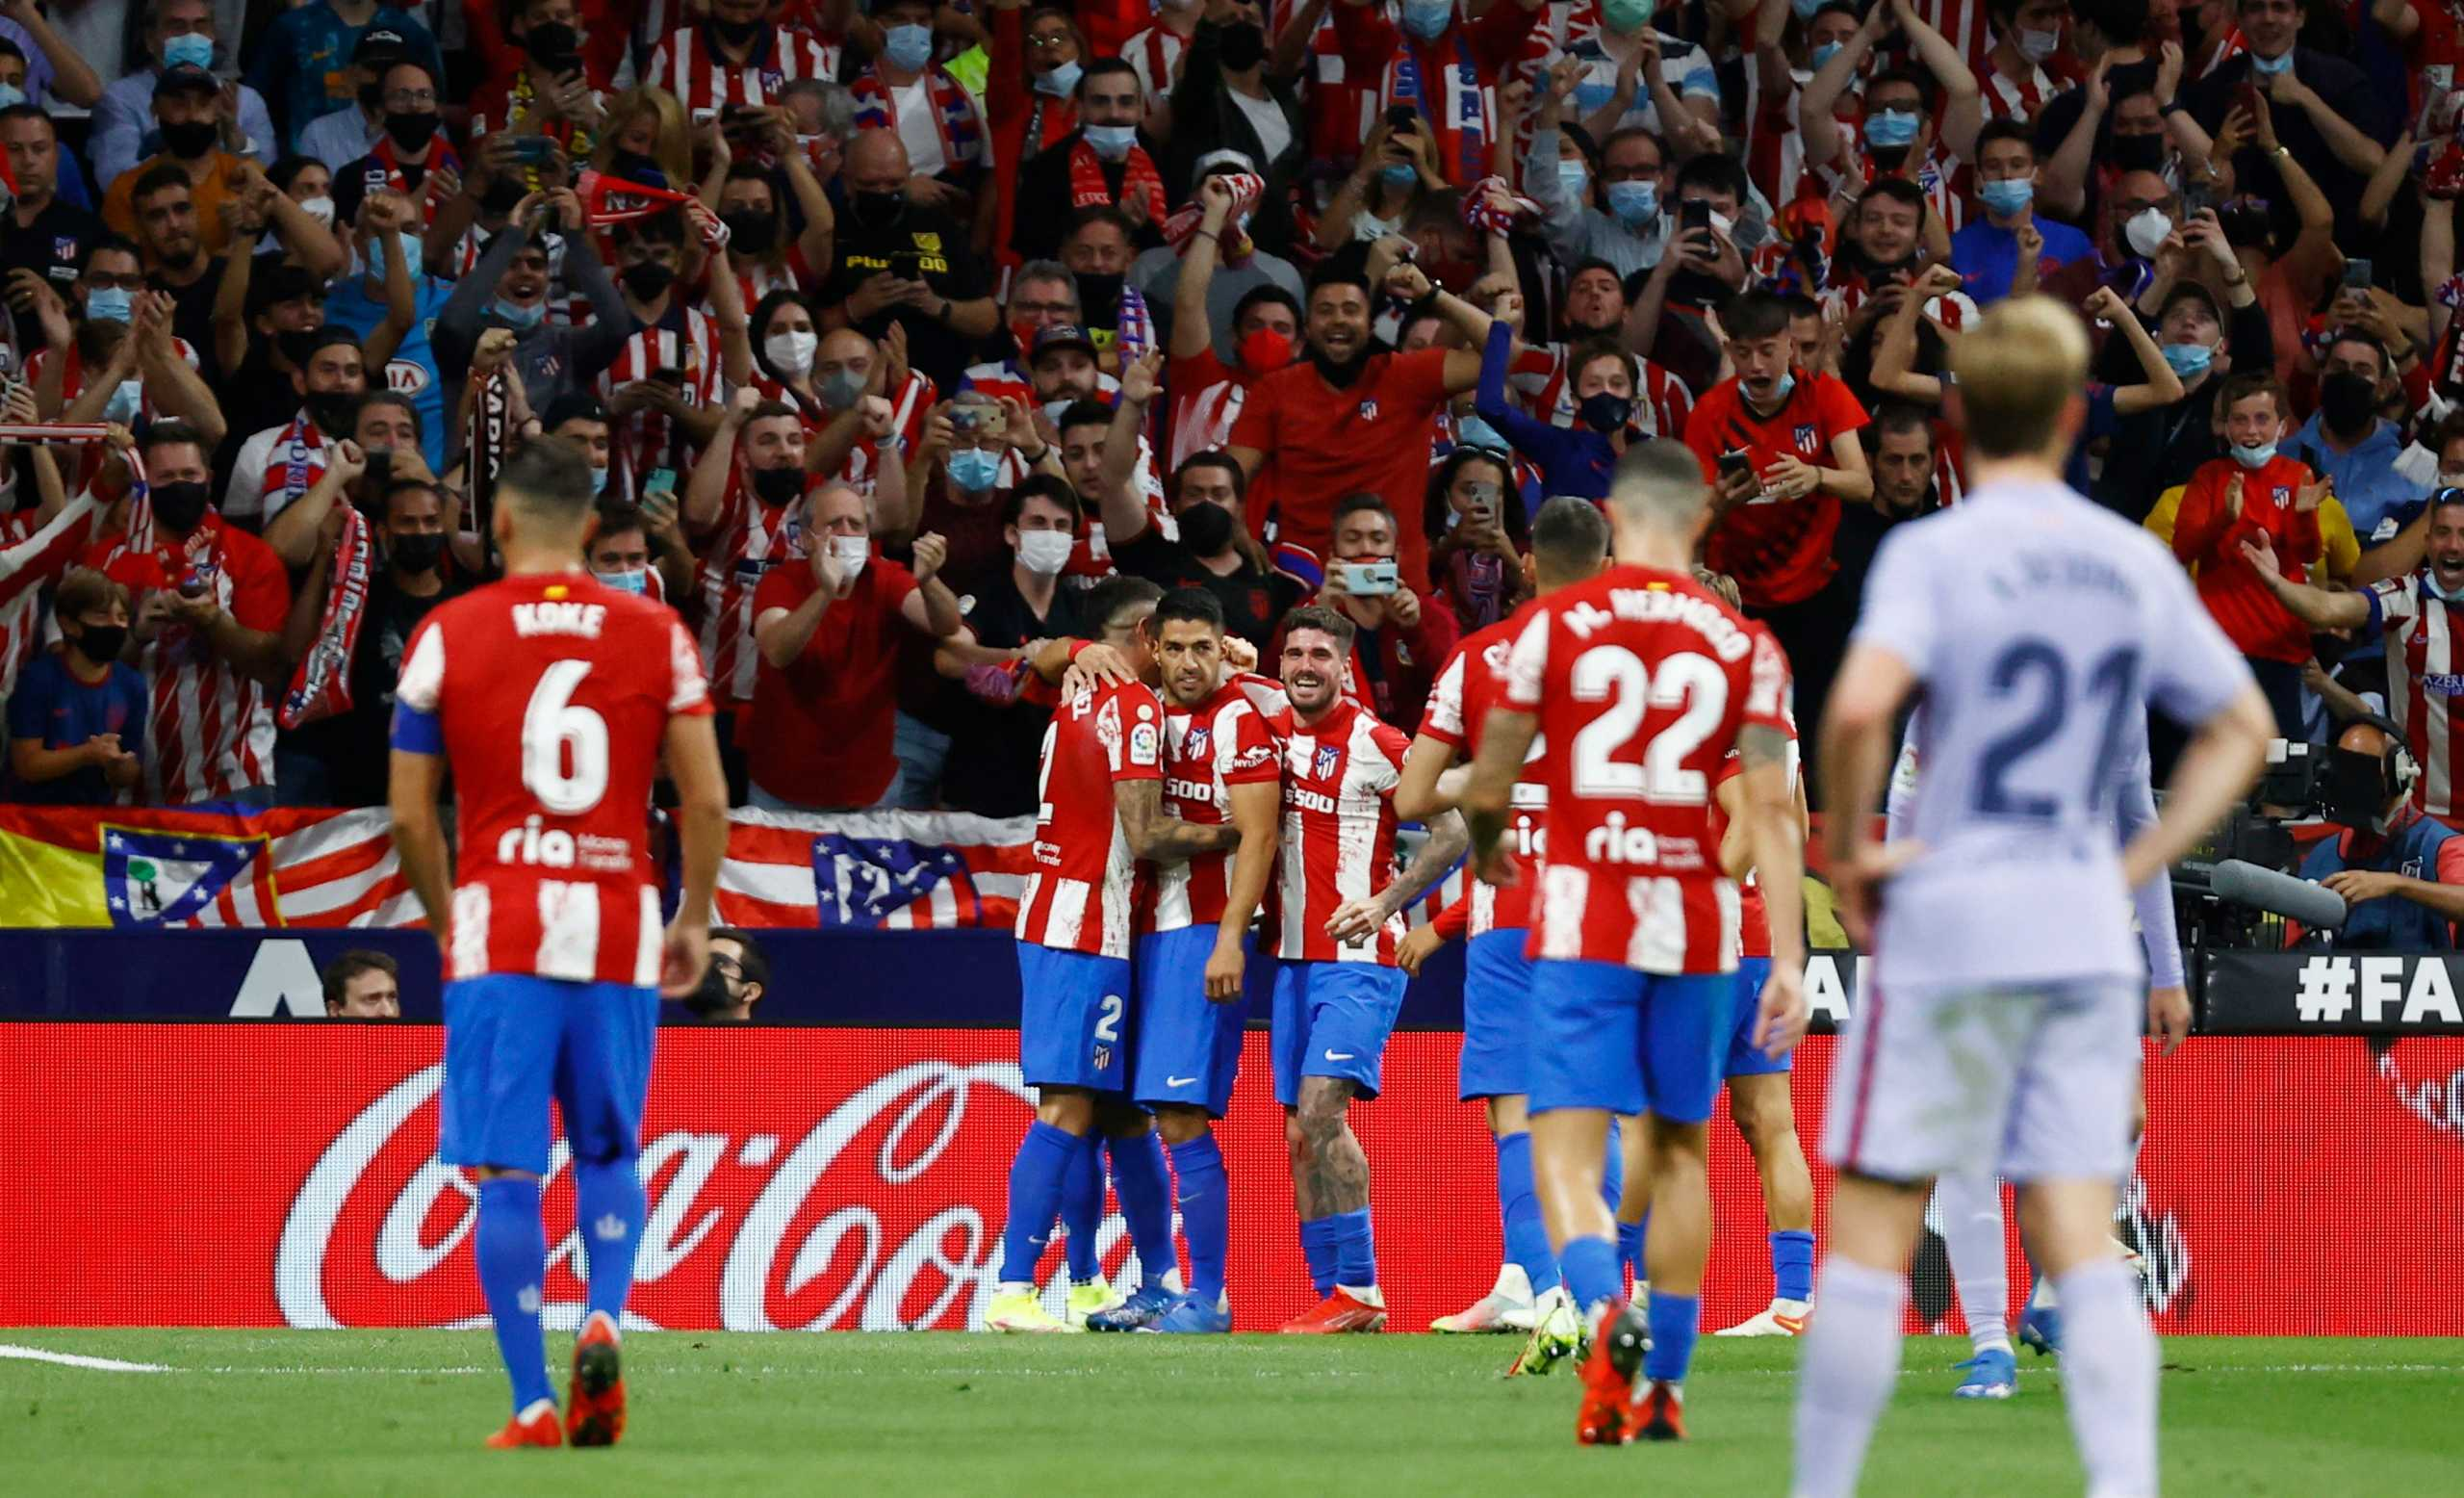 La Liga, Ατλέτικο Μαδρίτης – Μπαρτσελόνα 2-0: Εύκολη νίκη για τους «ροχιμπλάνκος»